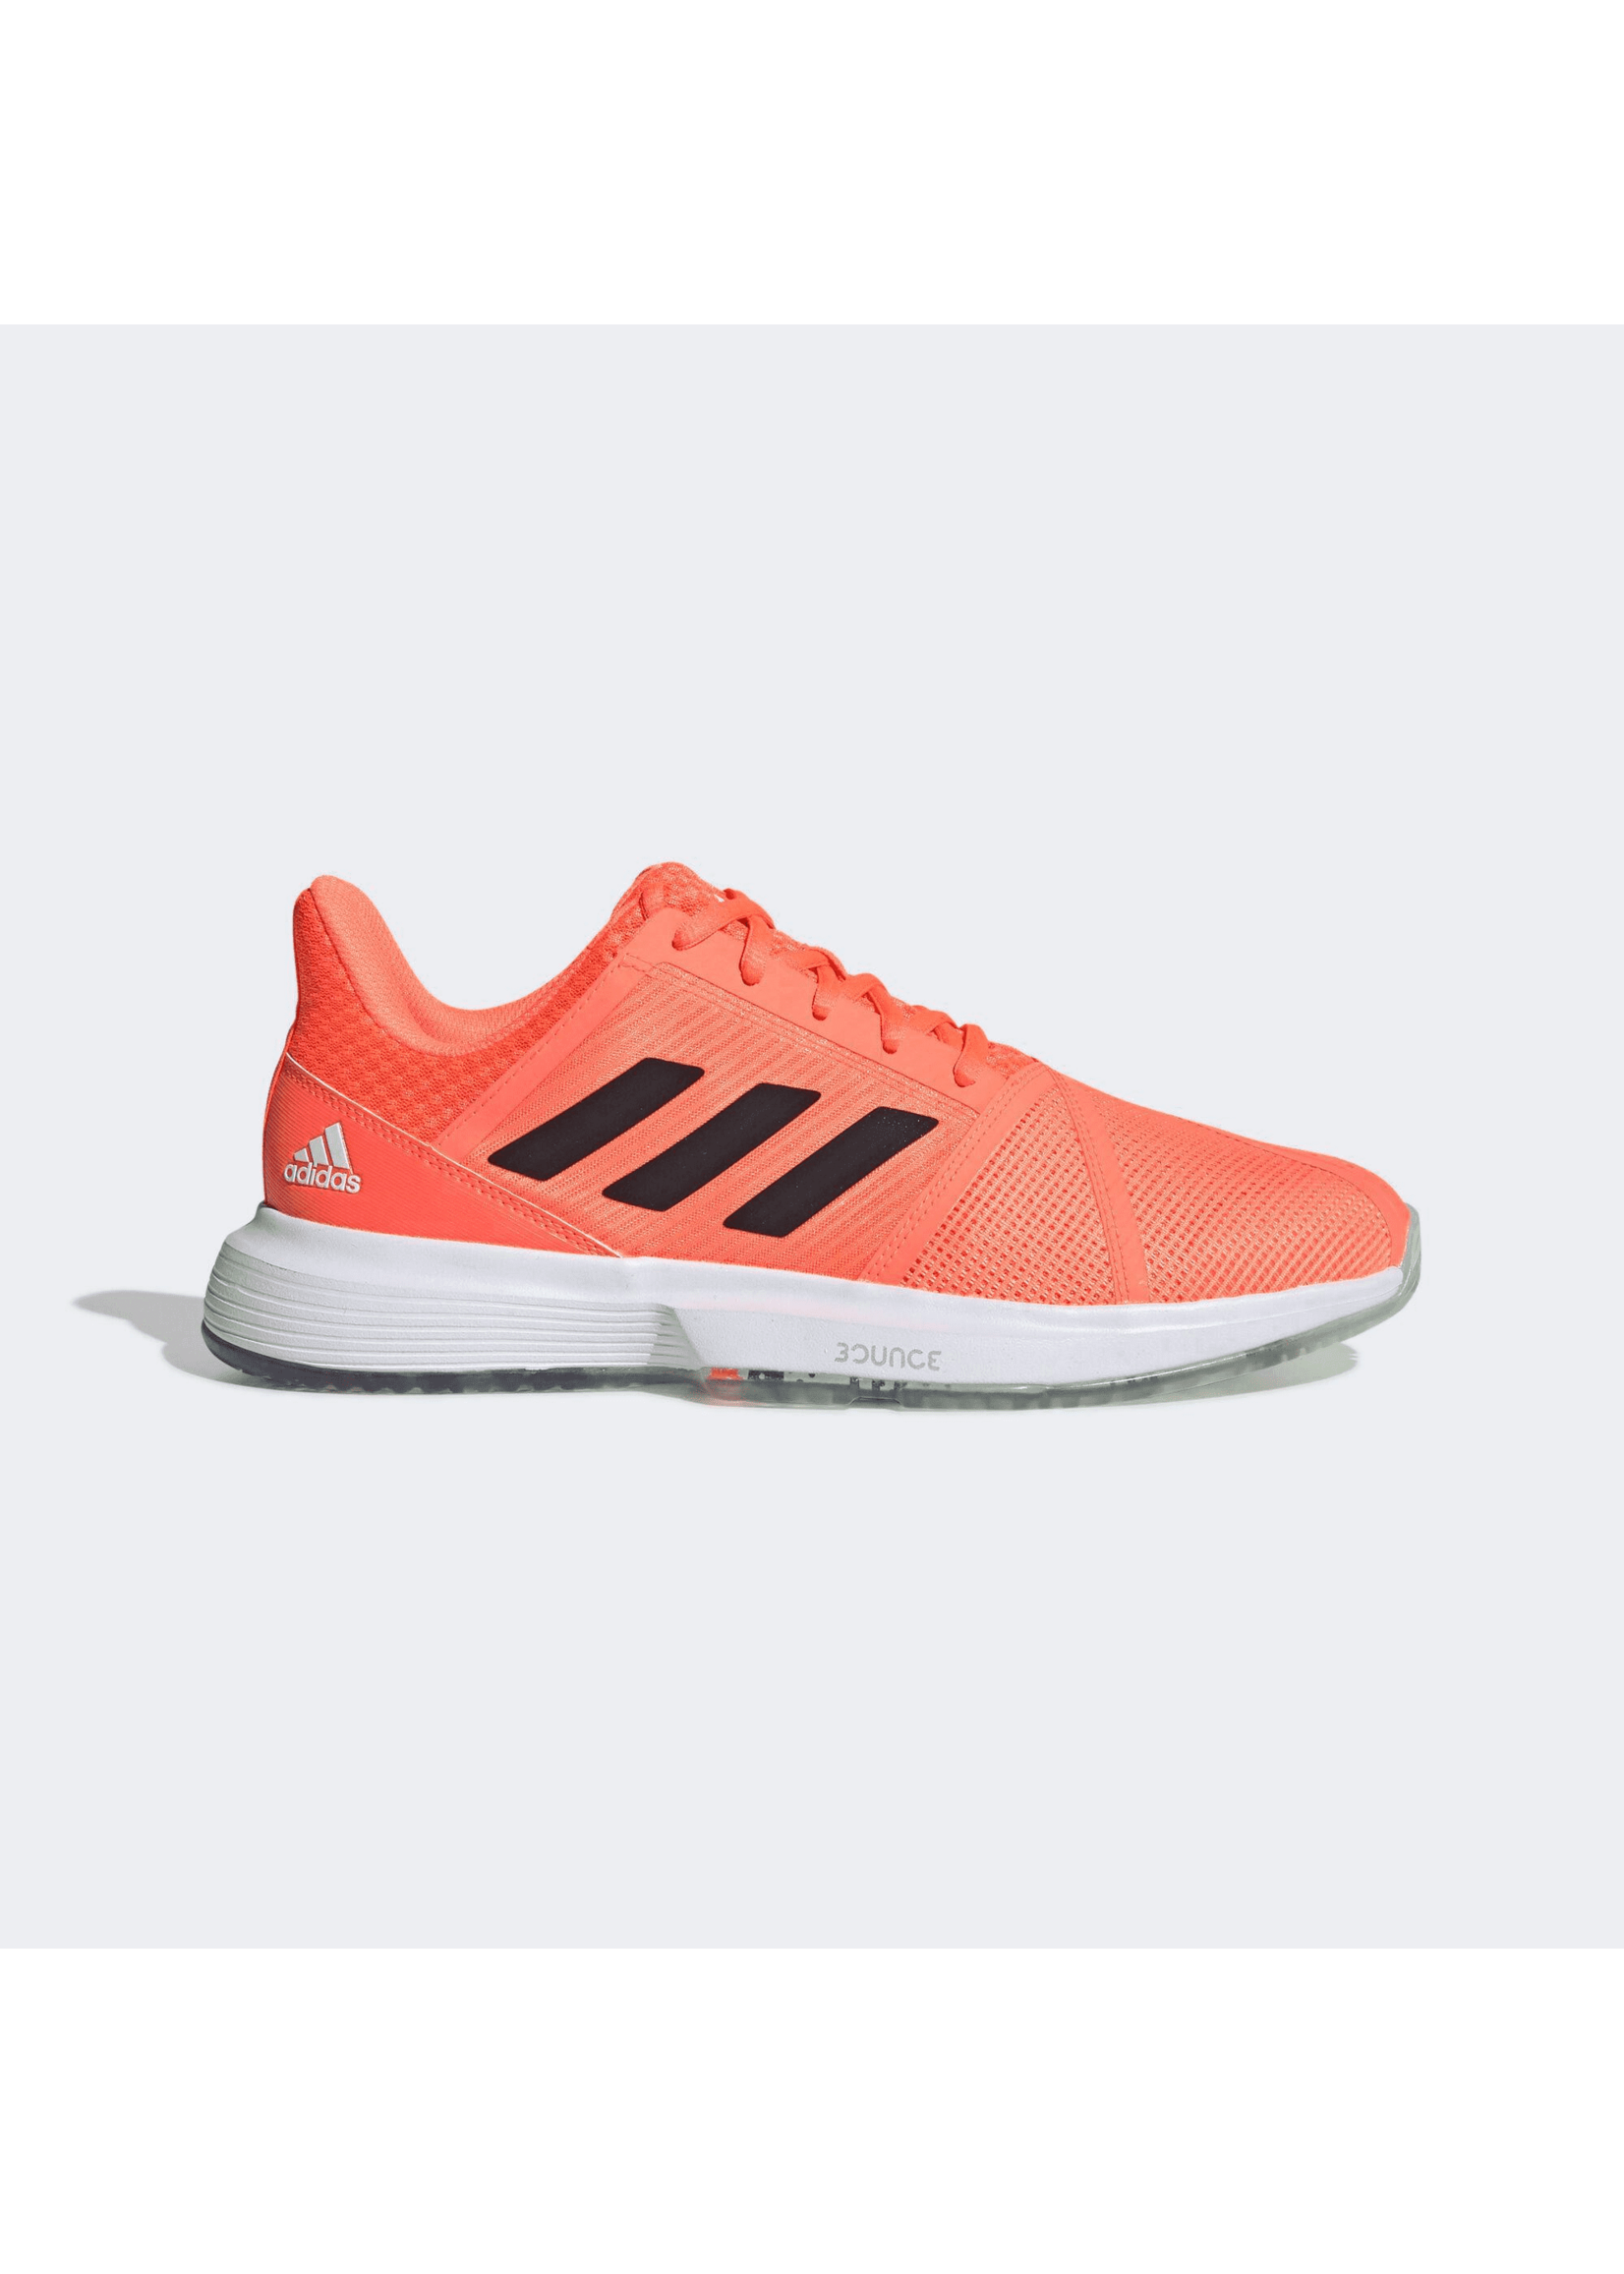 Adidas Adidas CourtJam Bounce Mens Tennis Shoes (2020)